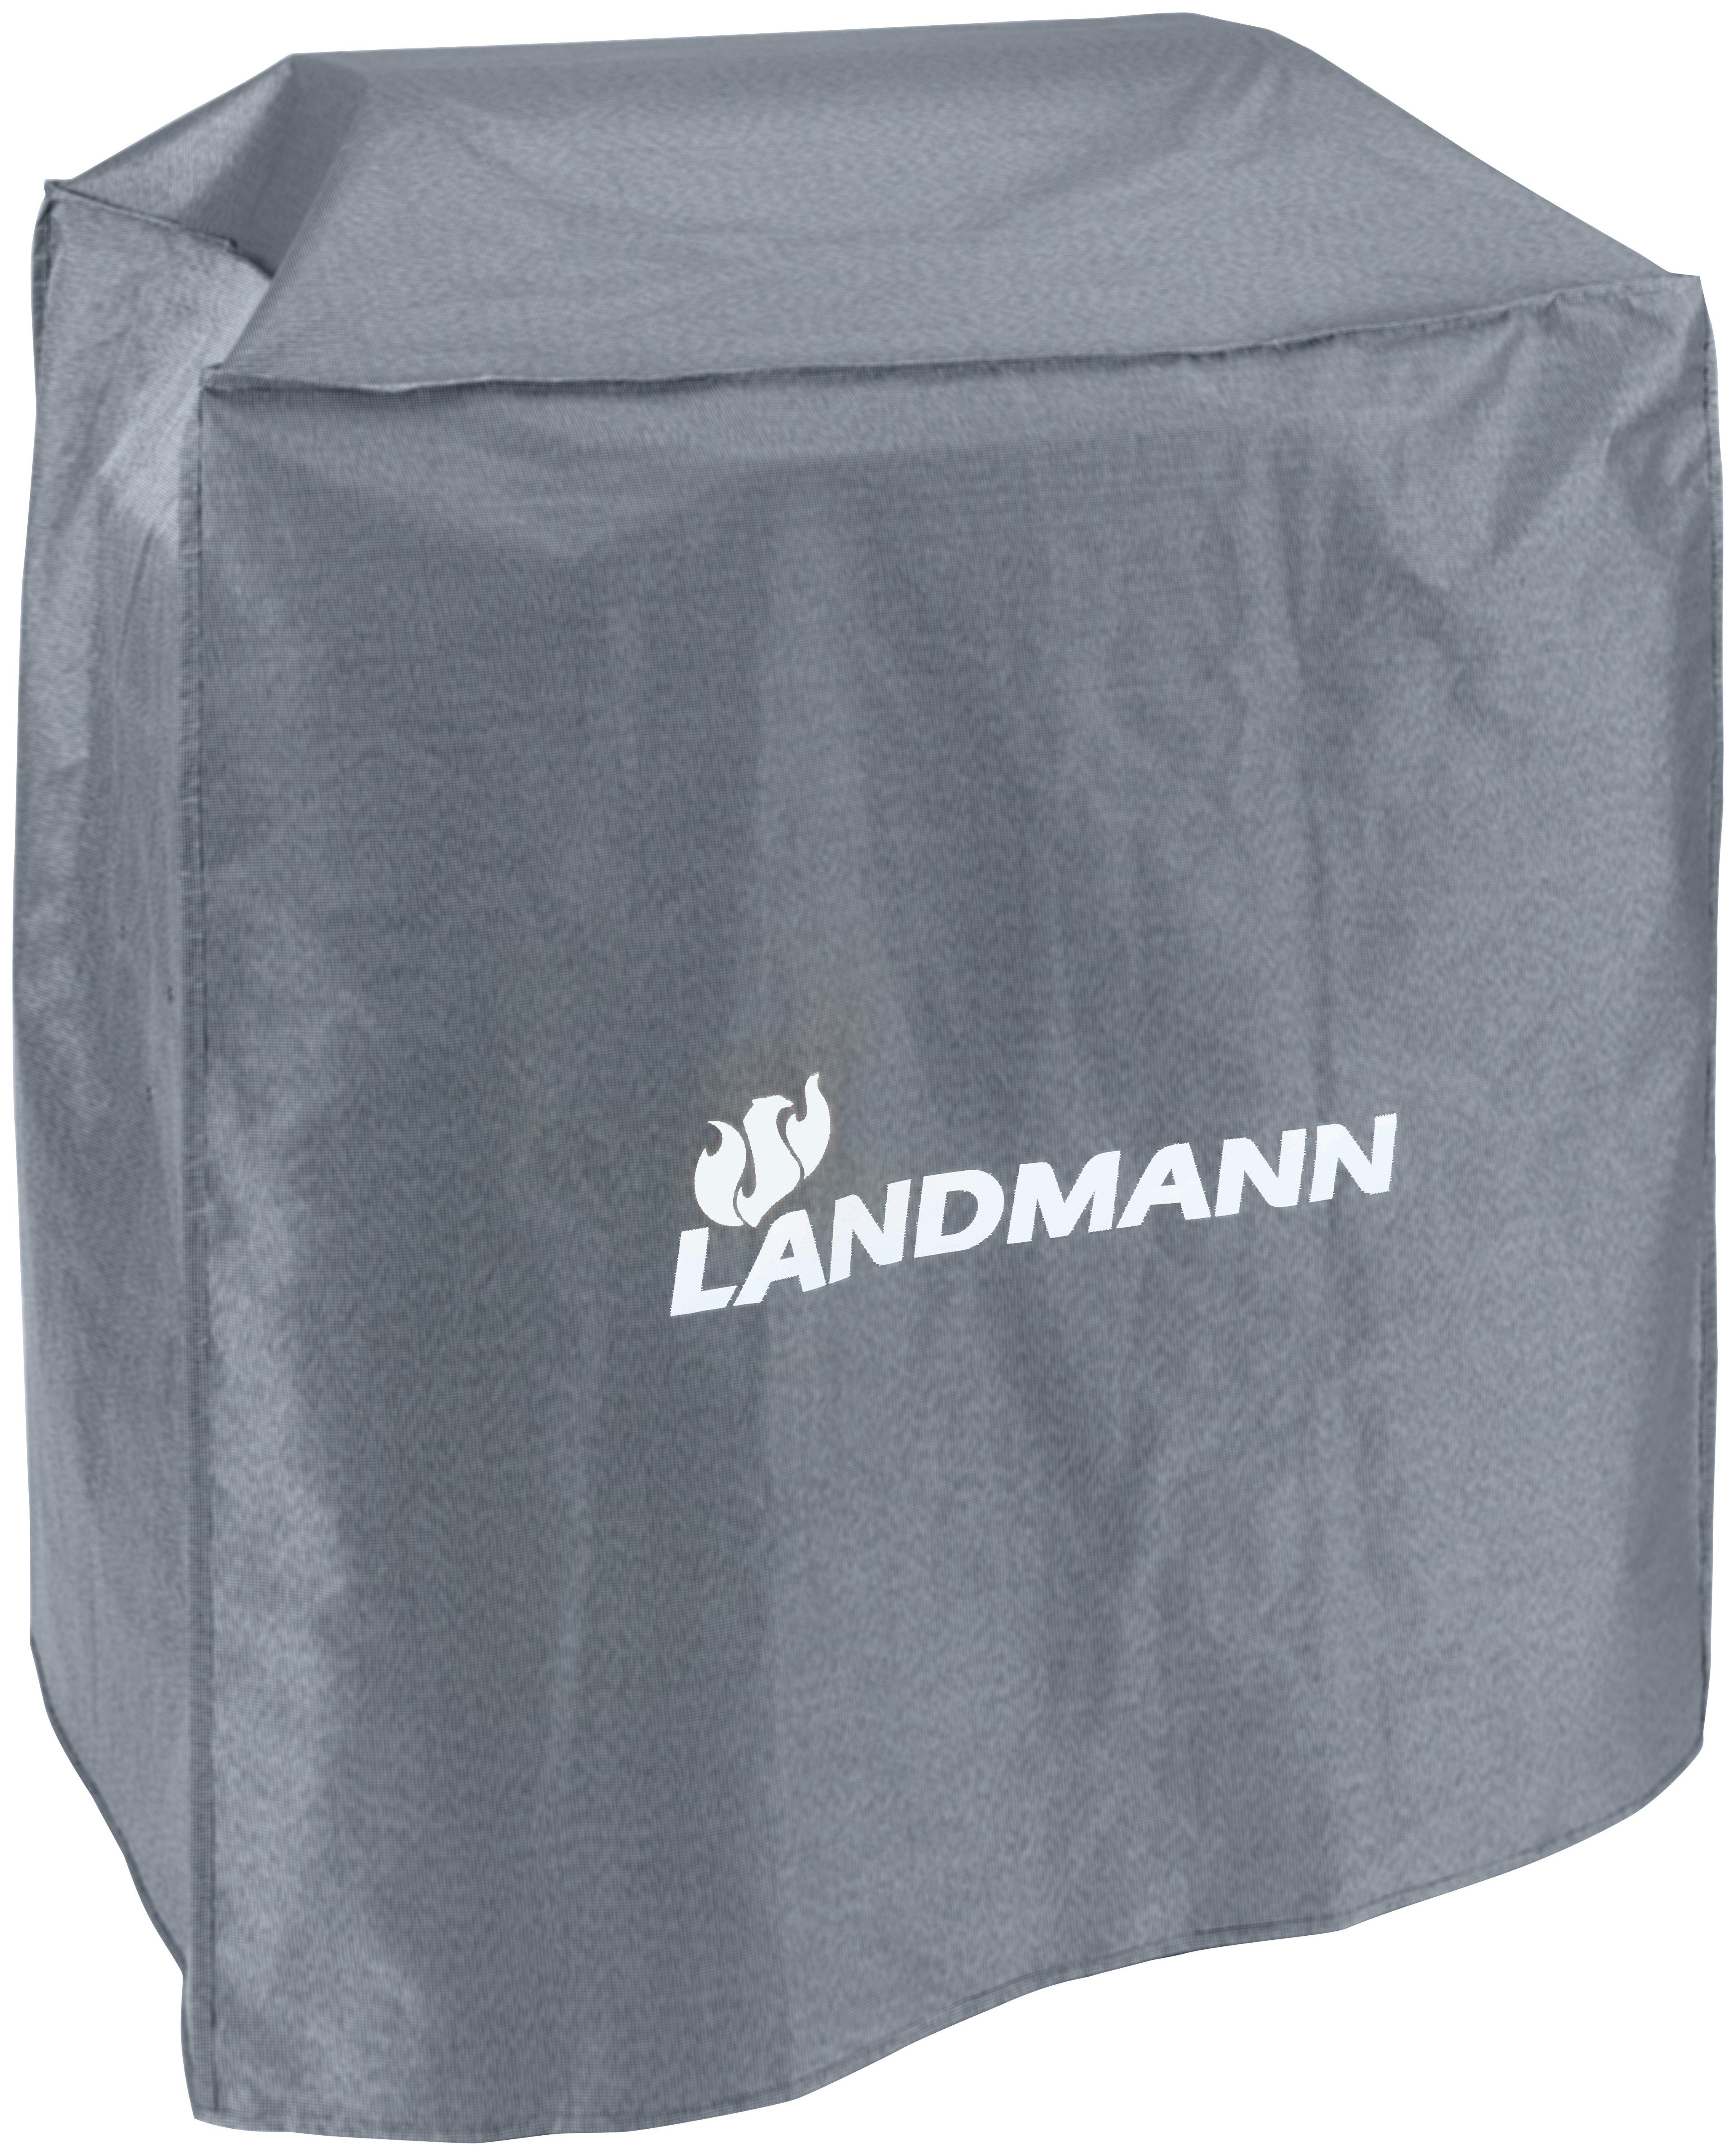 Landmann Premium Large BBQ Cover